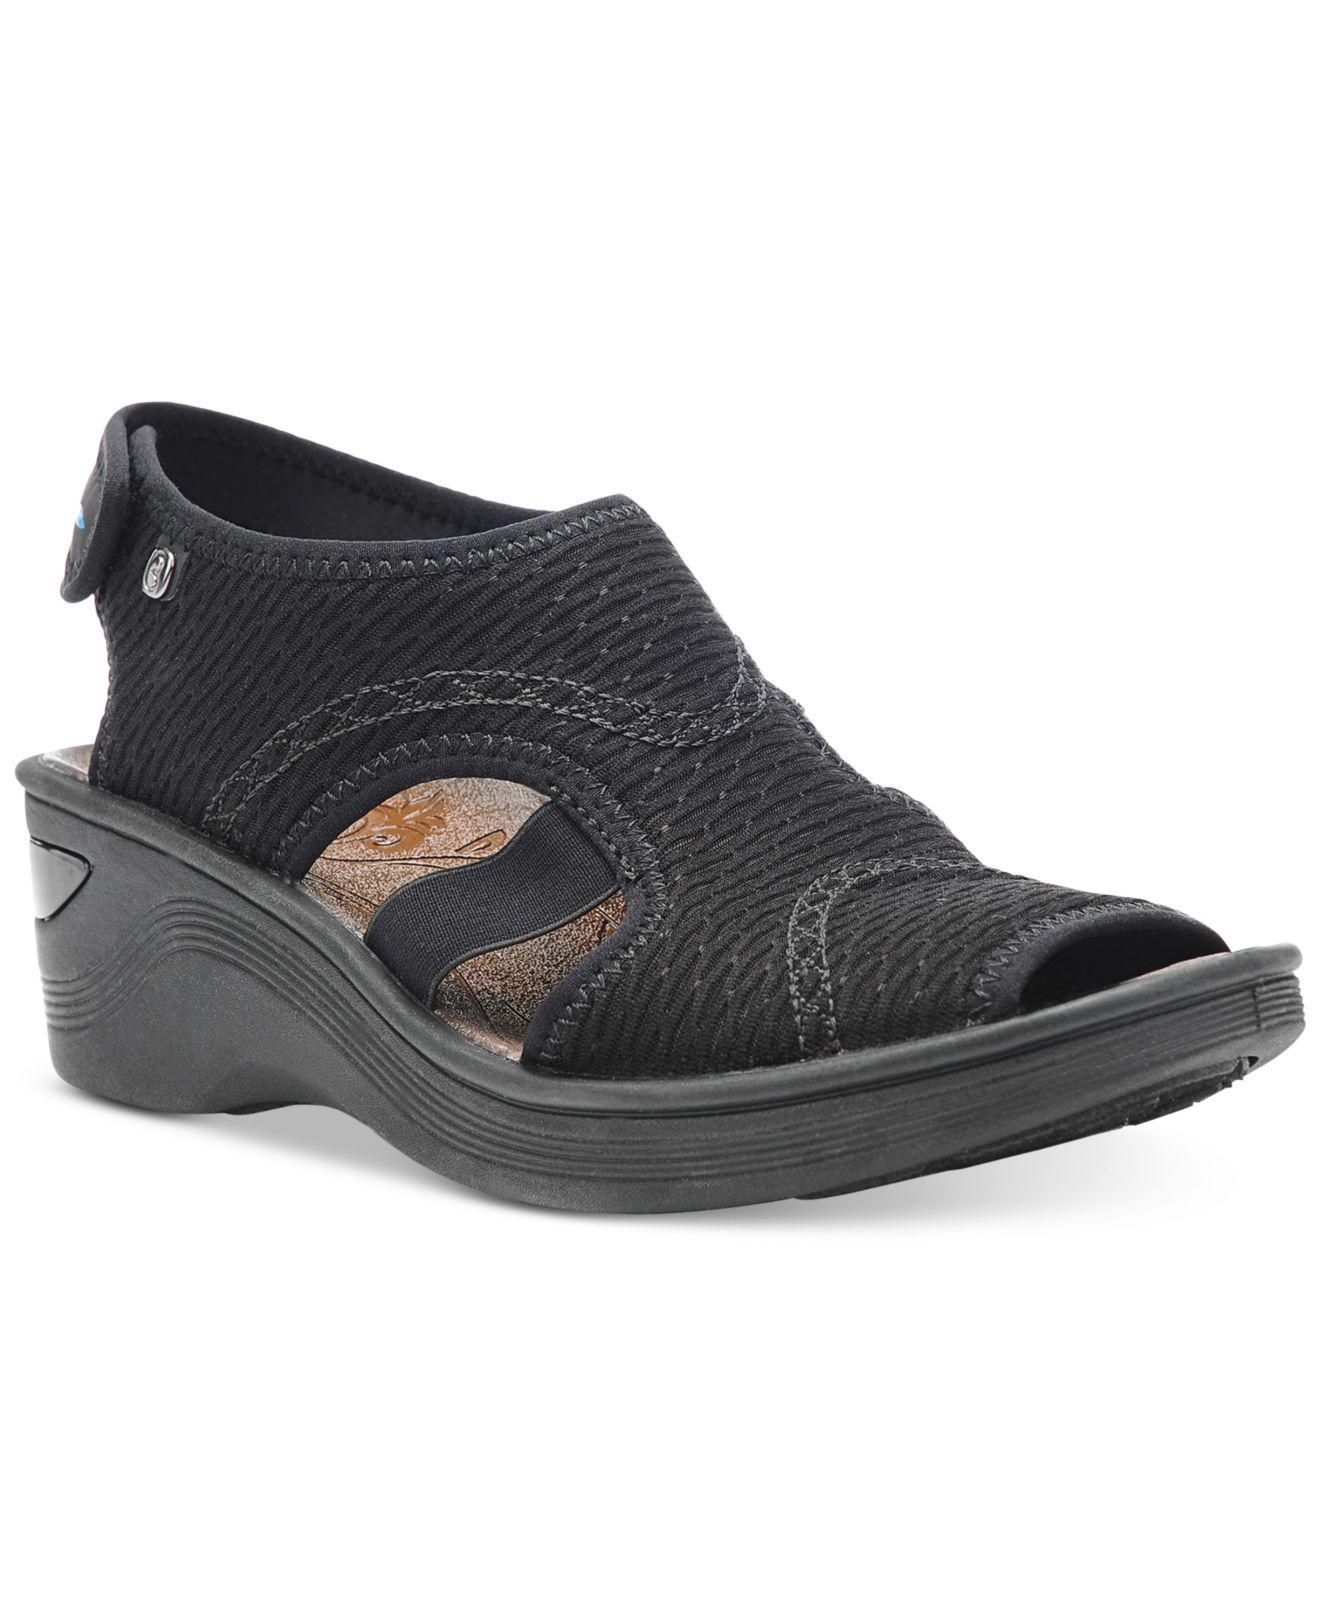 452c477eb9b Lyst - Bzees Dream Wedge Sandals in Black